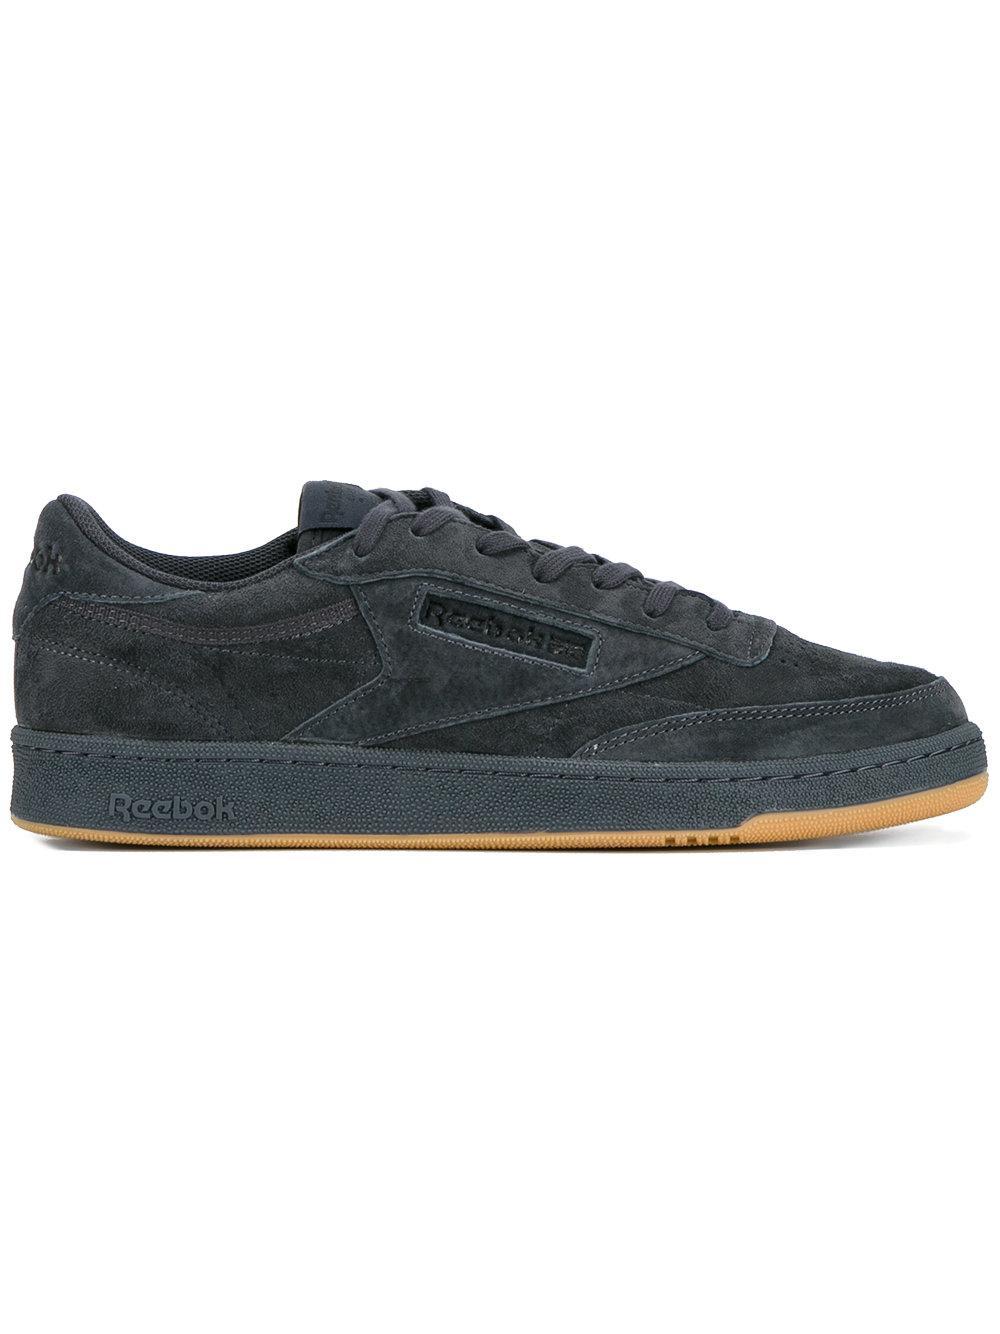 lyst reebok club c 85 tg low top sneakers in black for men. Black Bedroom Furniture Sets. Home Design Ideas